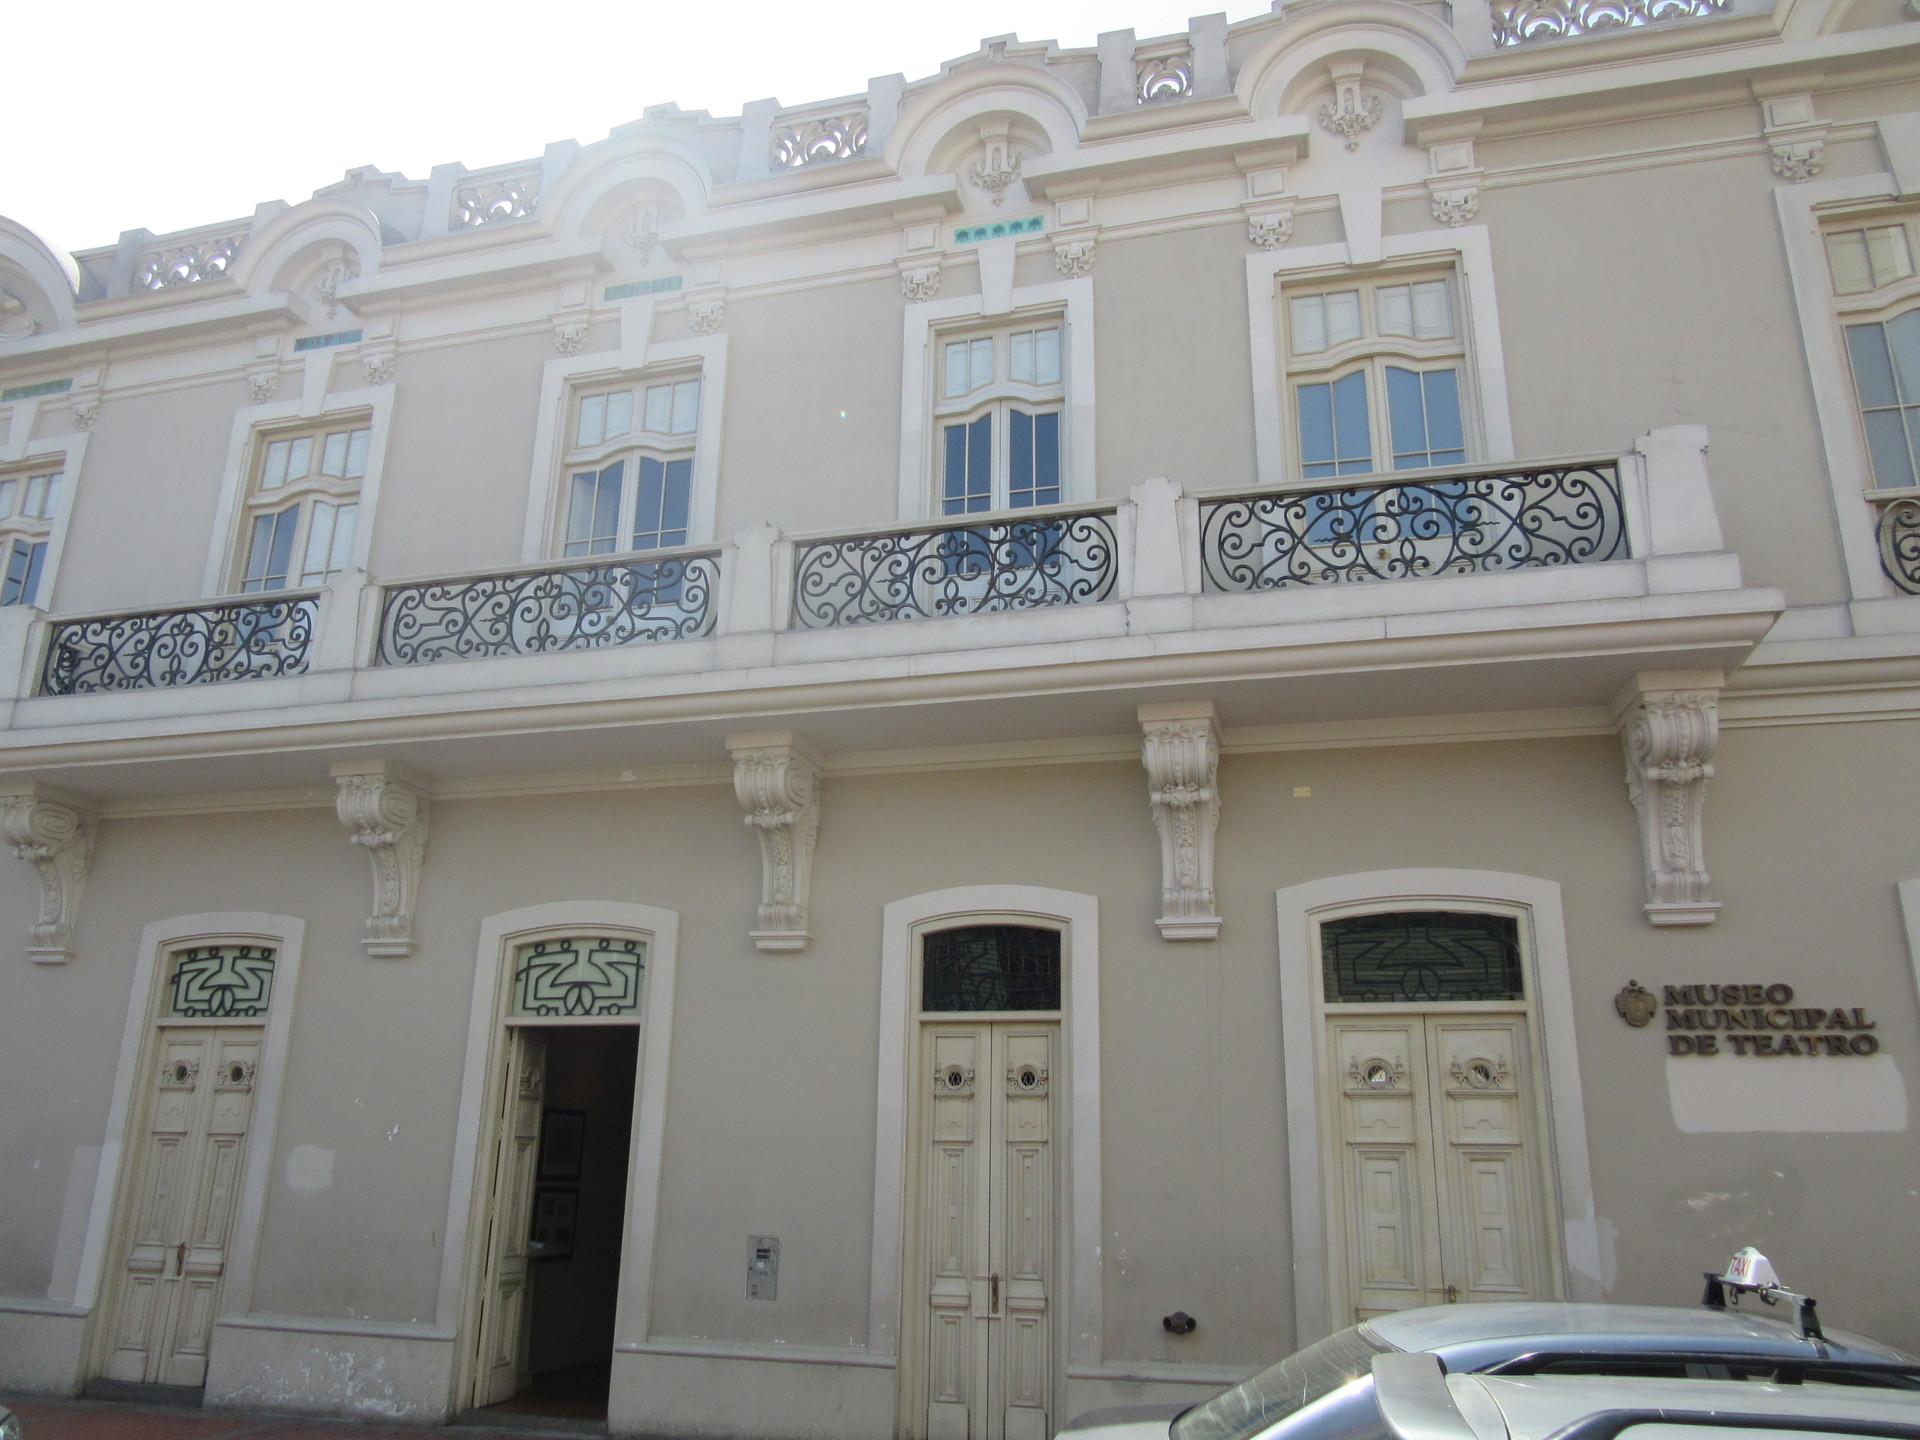 visitando-museo-municipal-teatro-efd88c0